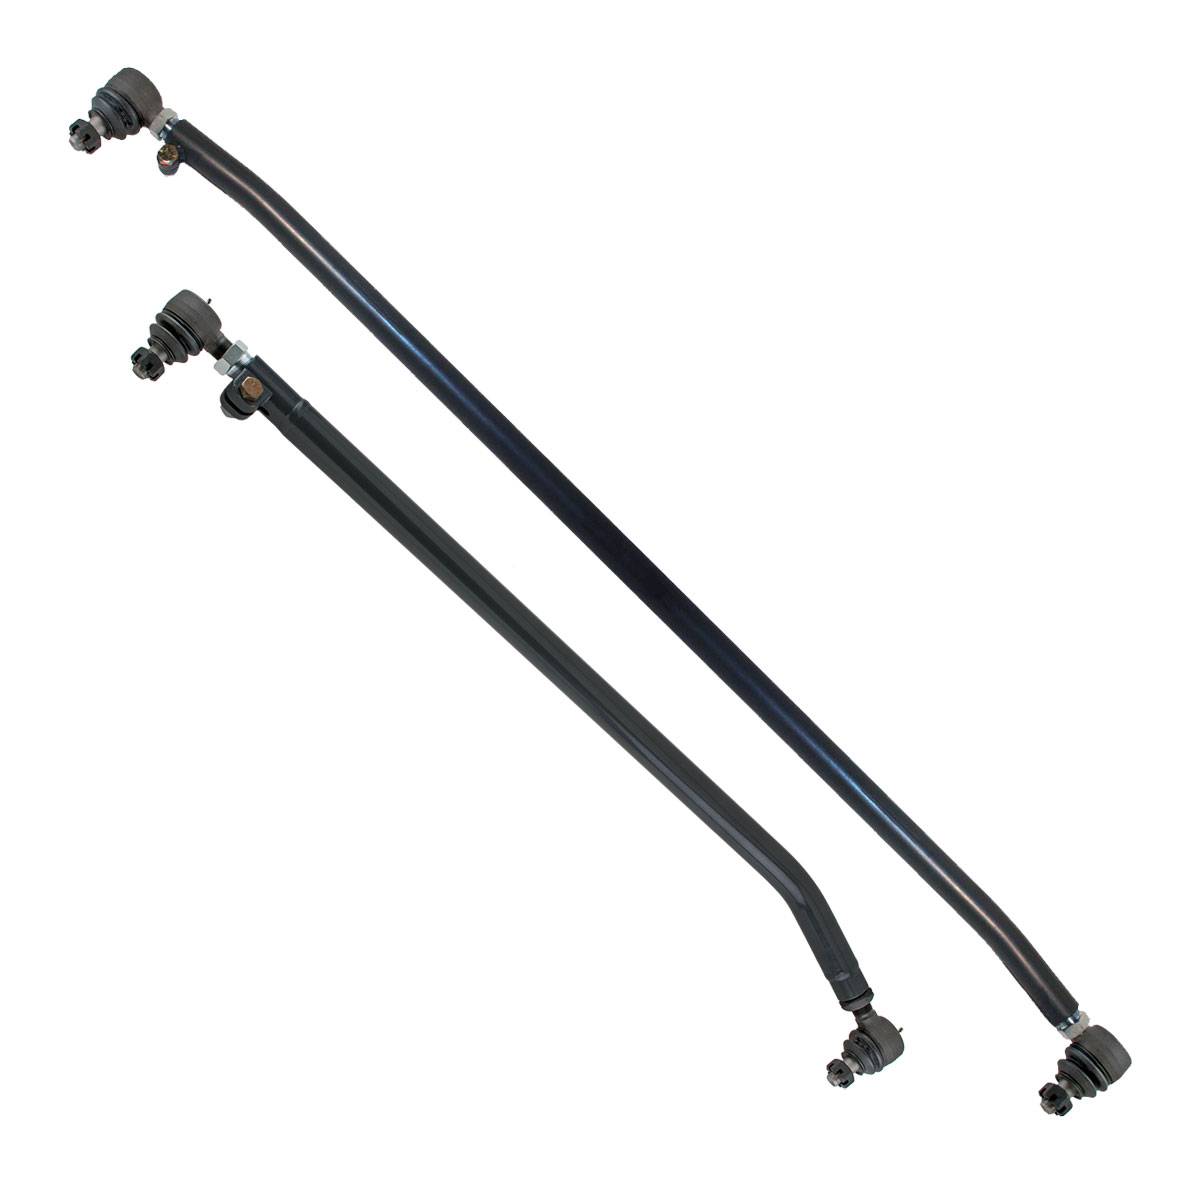 Synergy HD Steering Kit - JK